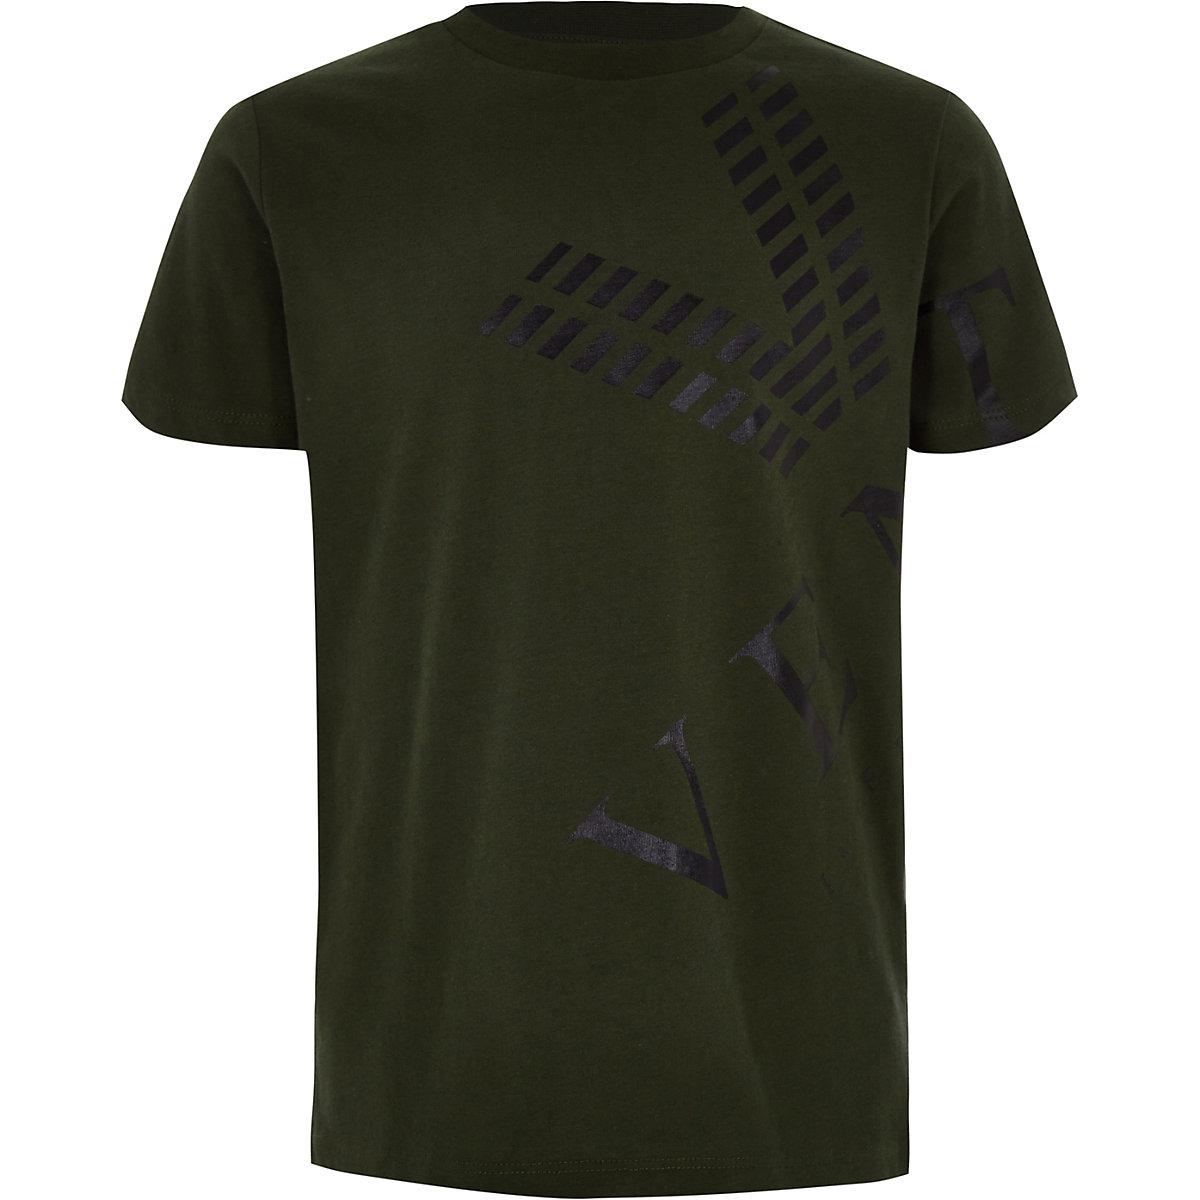 T-shirt à imprimé « Venti » kaki garçon